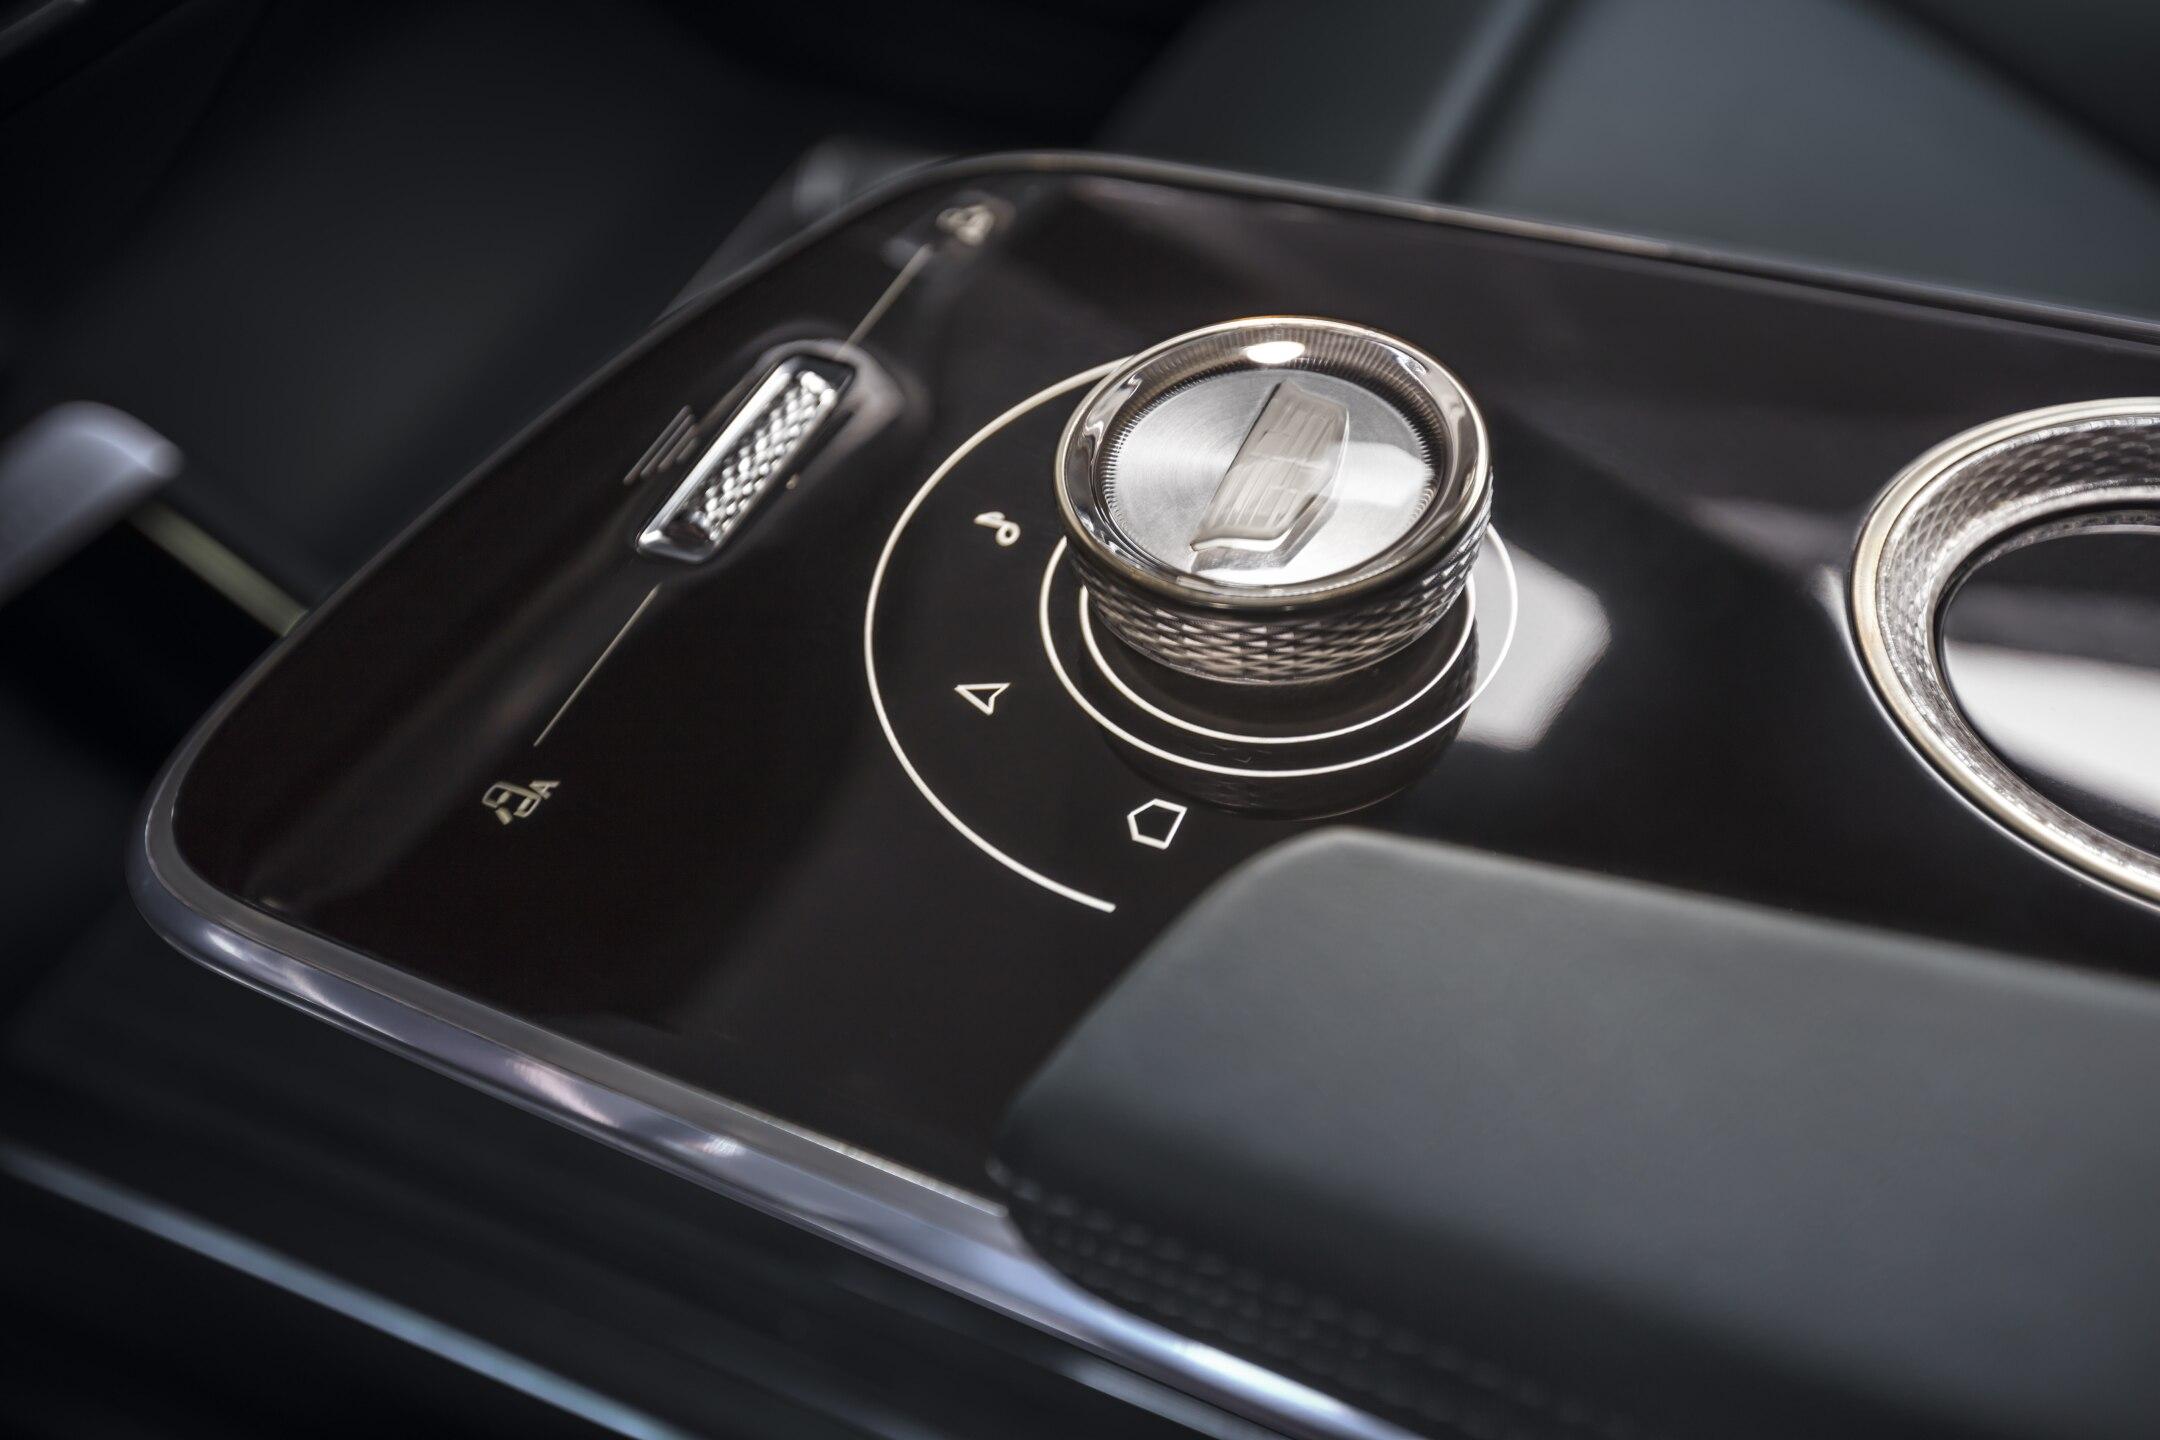 Cadillac LYRIQ's new electric vehicle architecture opens up po